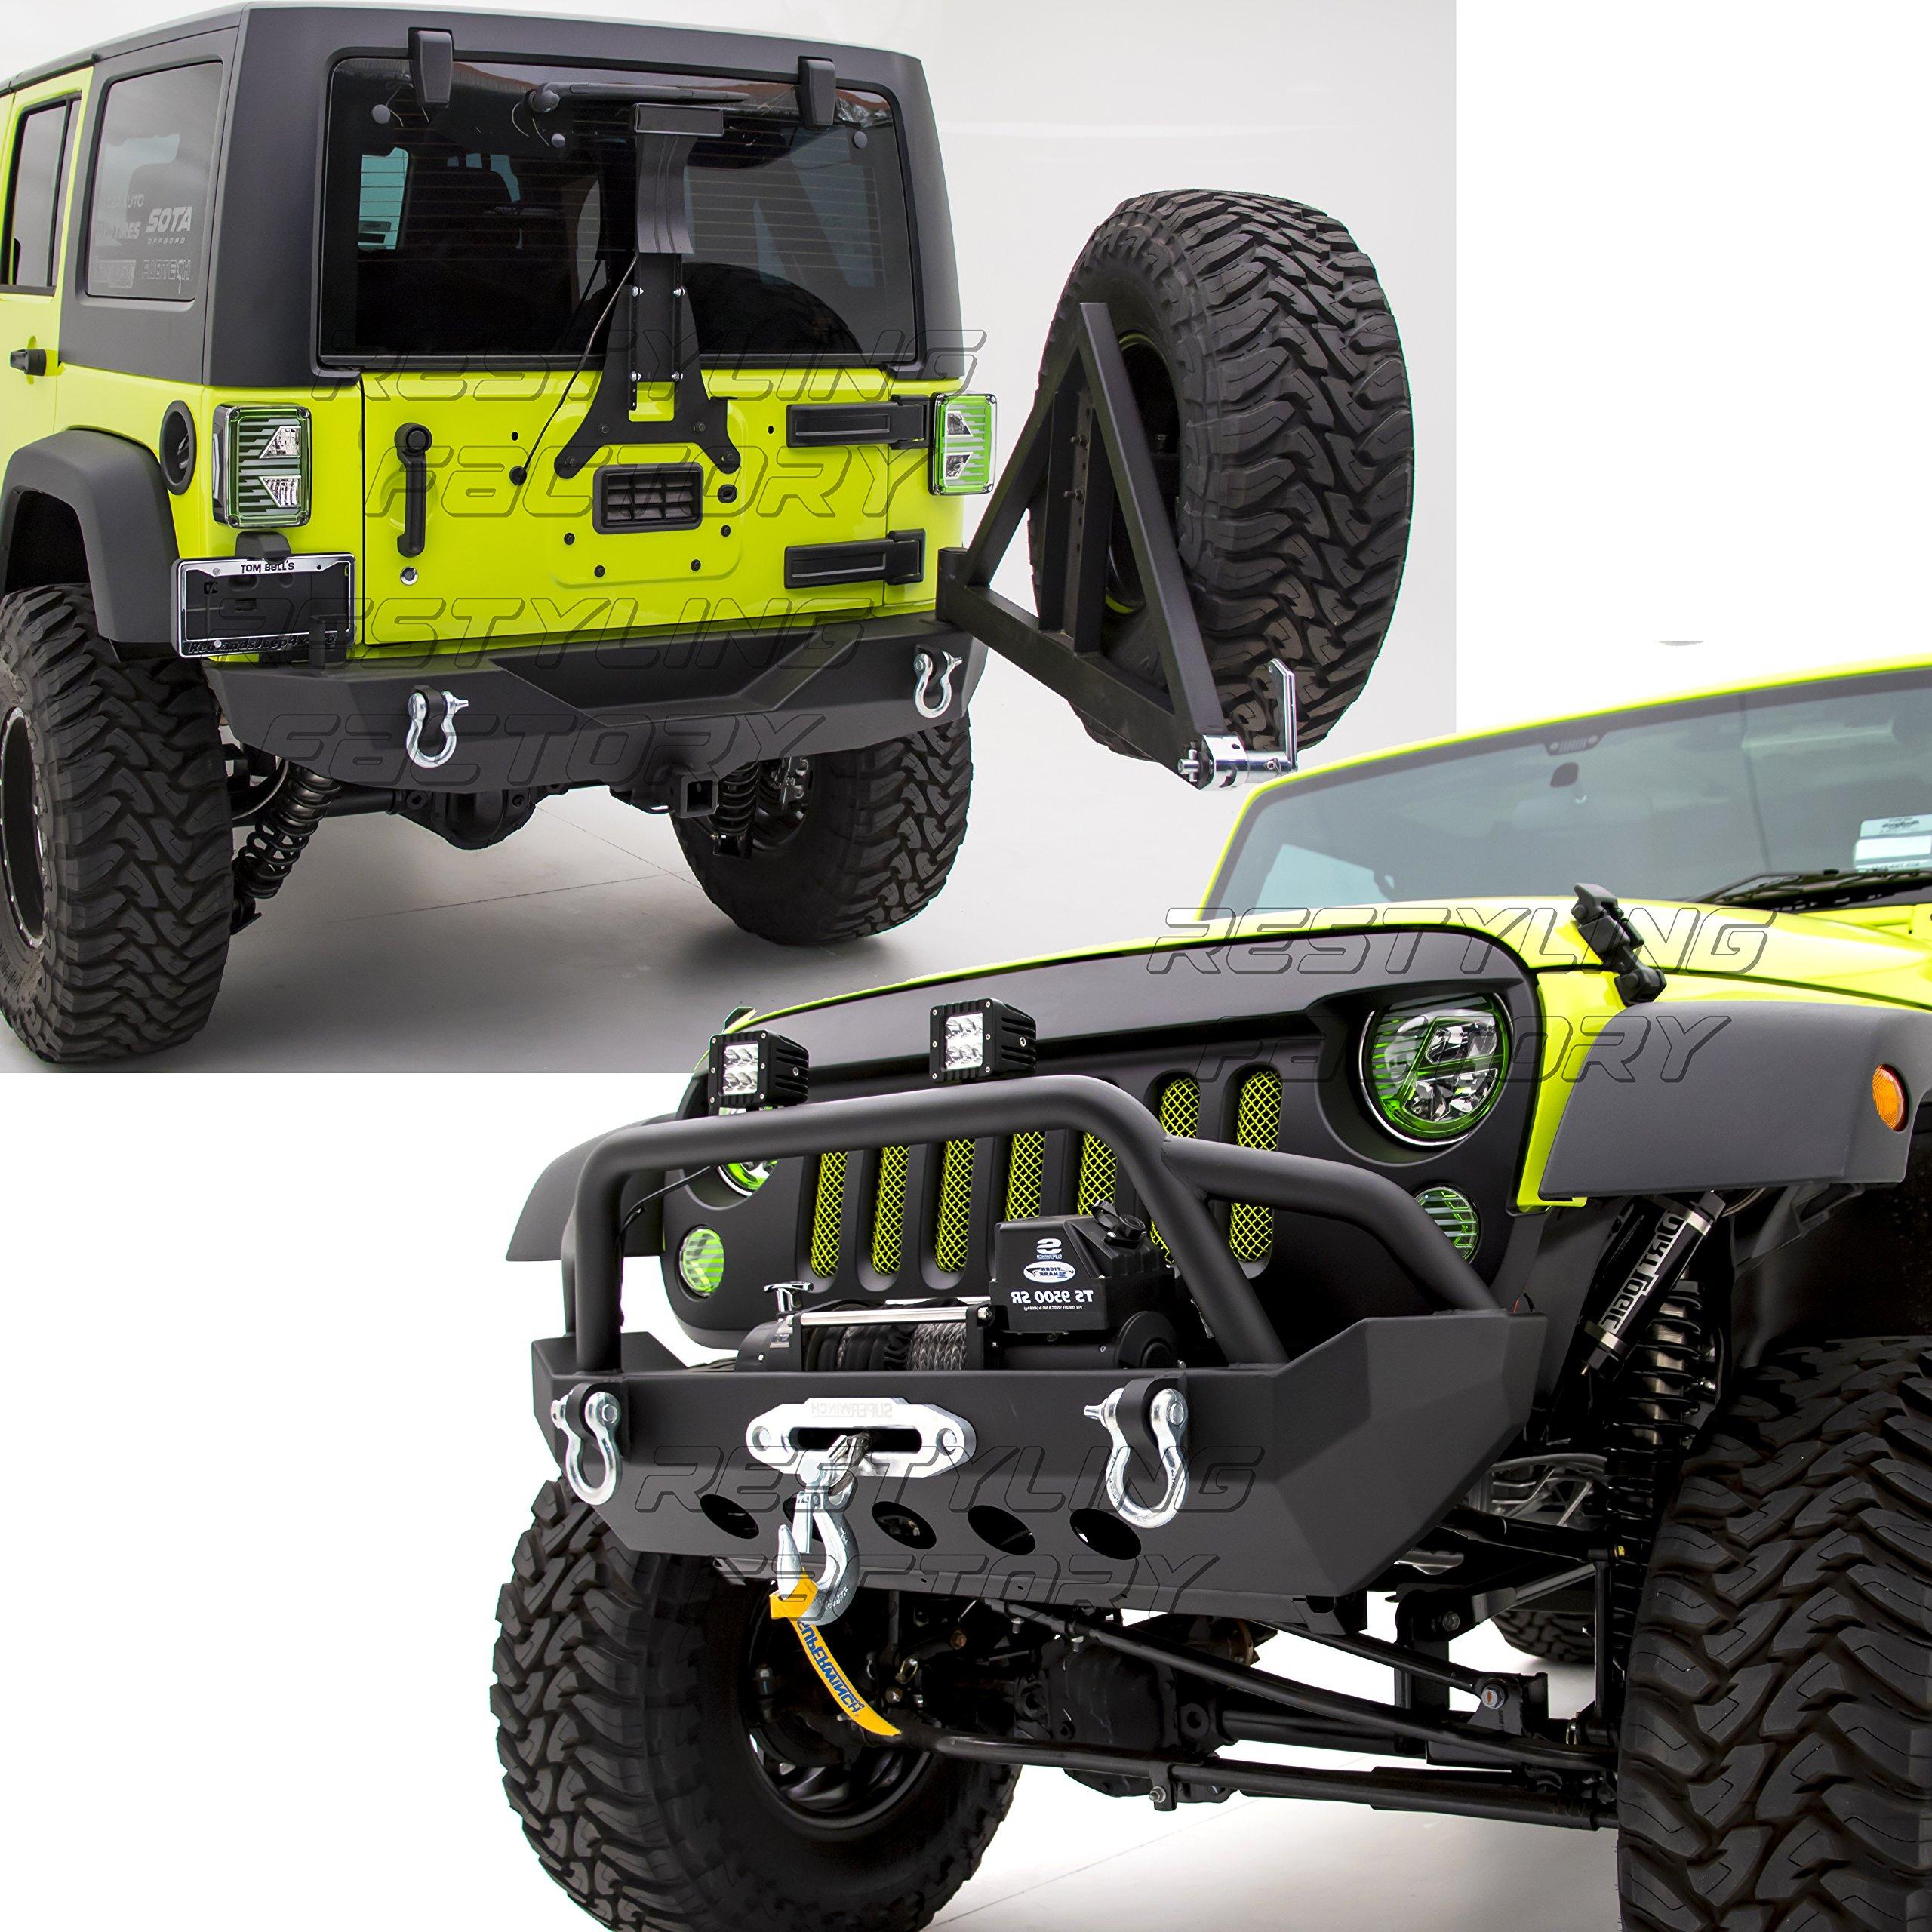 2008 jeep wrangler bumper combo with winch amazon com Jeep Wrangler Jk Winch Bumpers